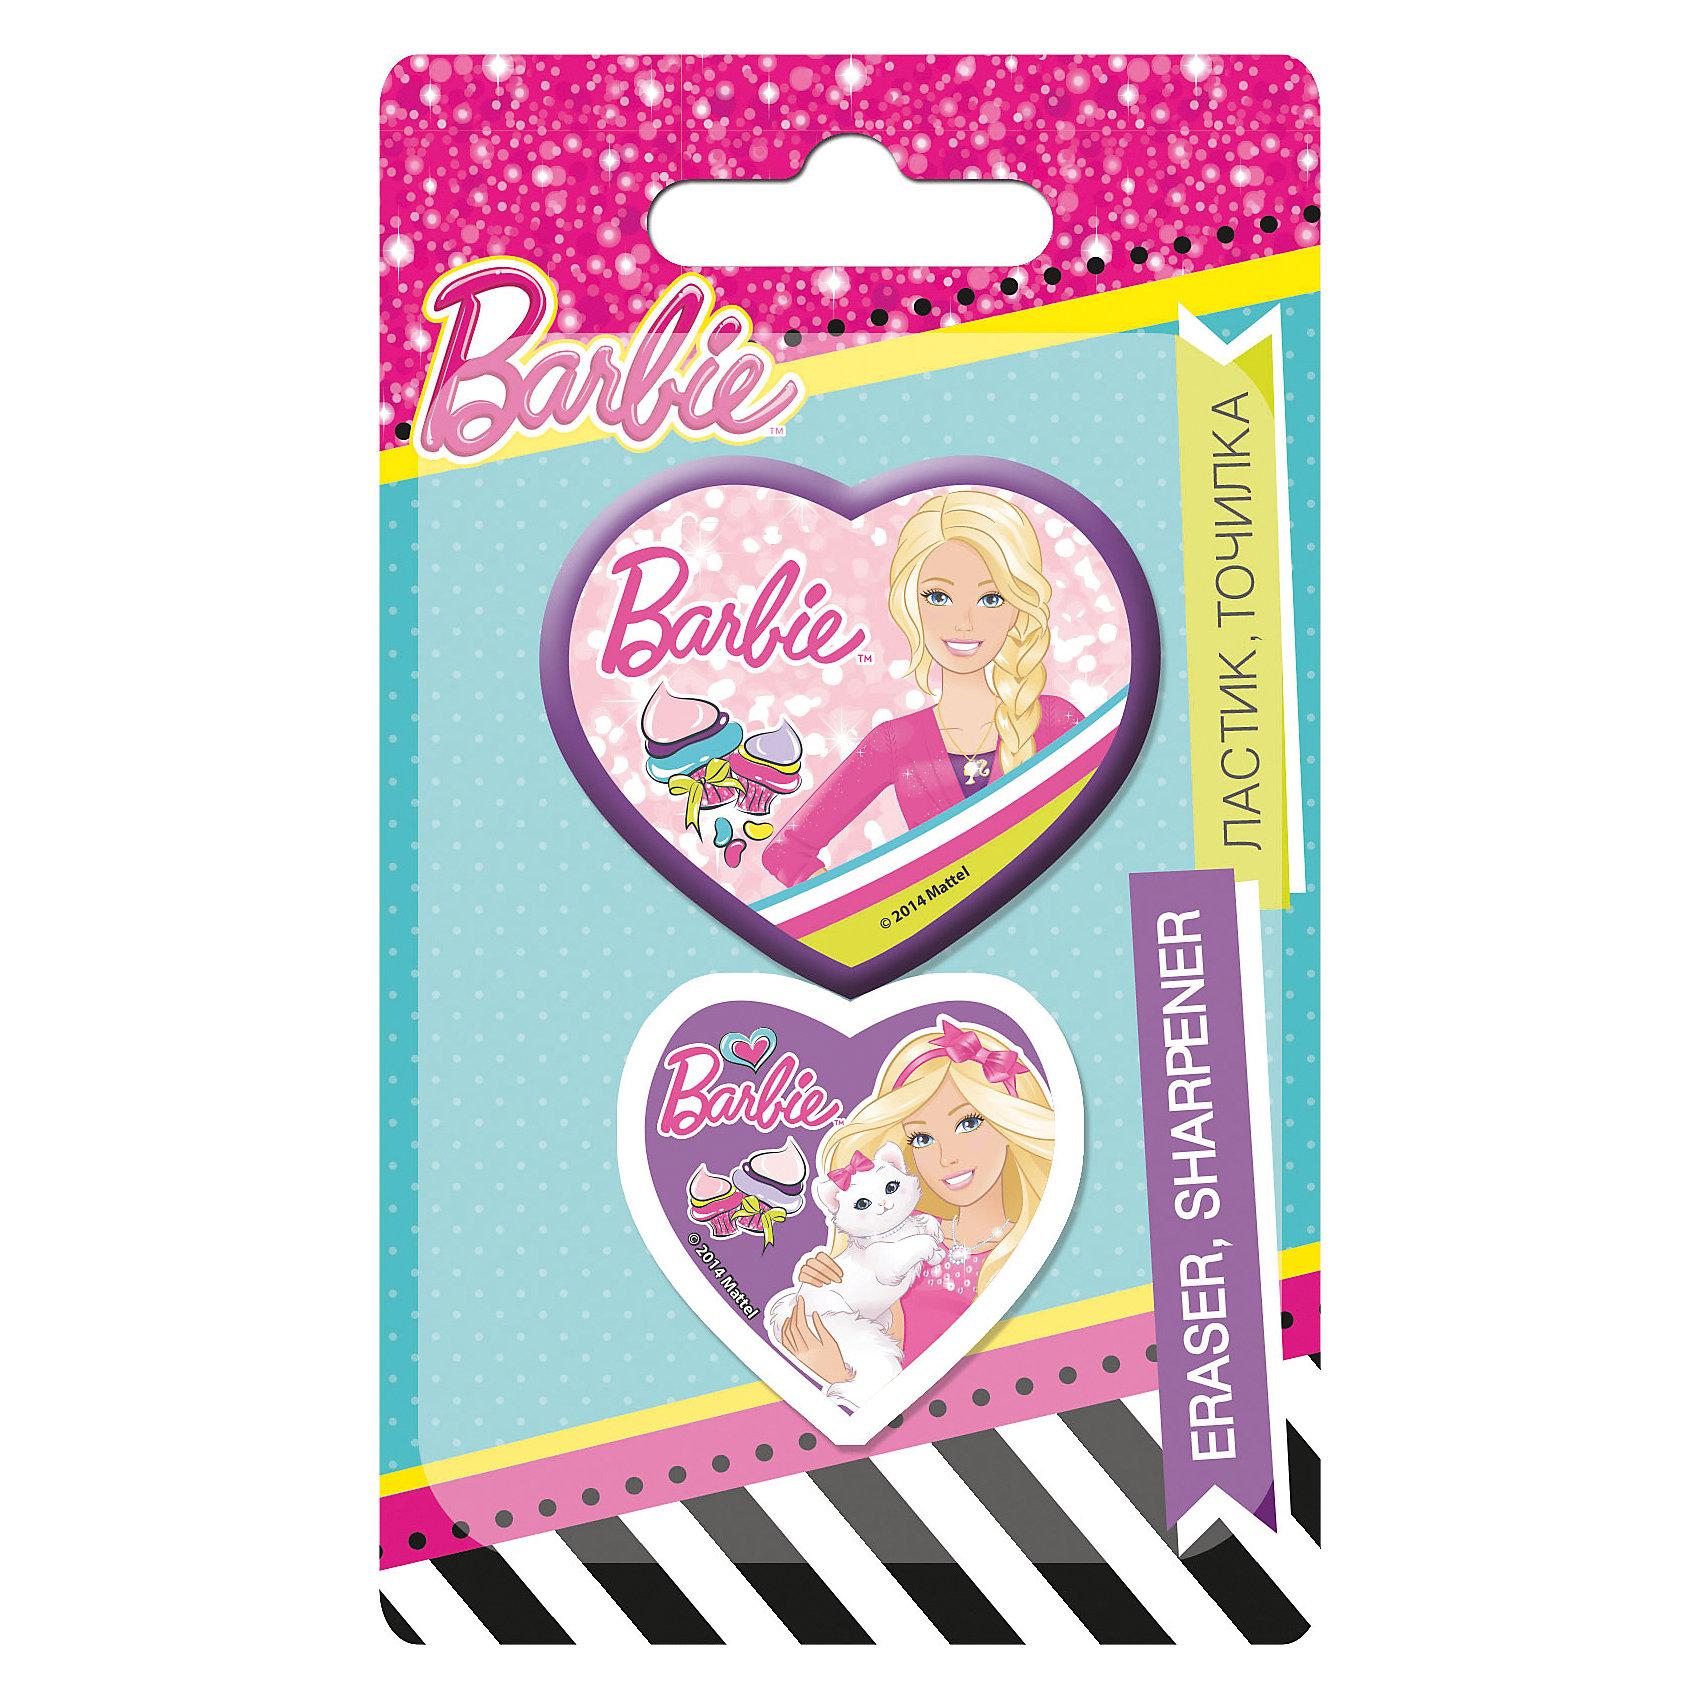 Академия групп Канцелярский набор (точилка, ластик), Barbie академия групп набор канцелярский в подарочной коробке человек паук